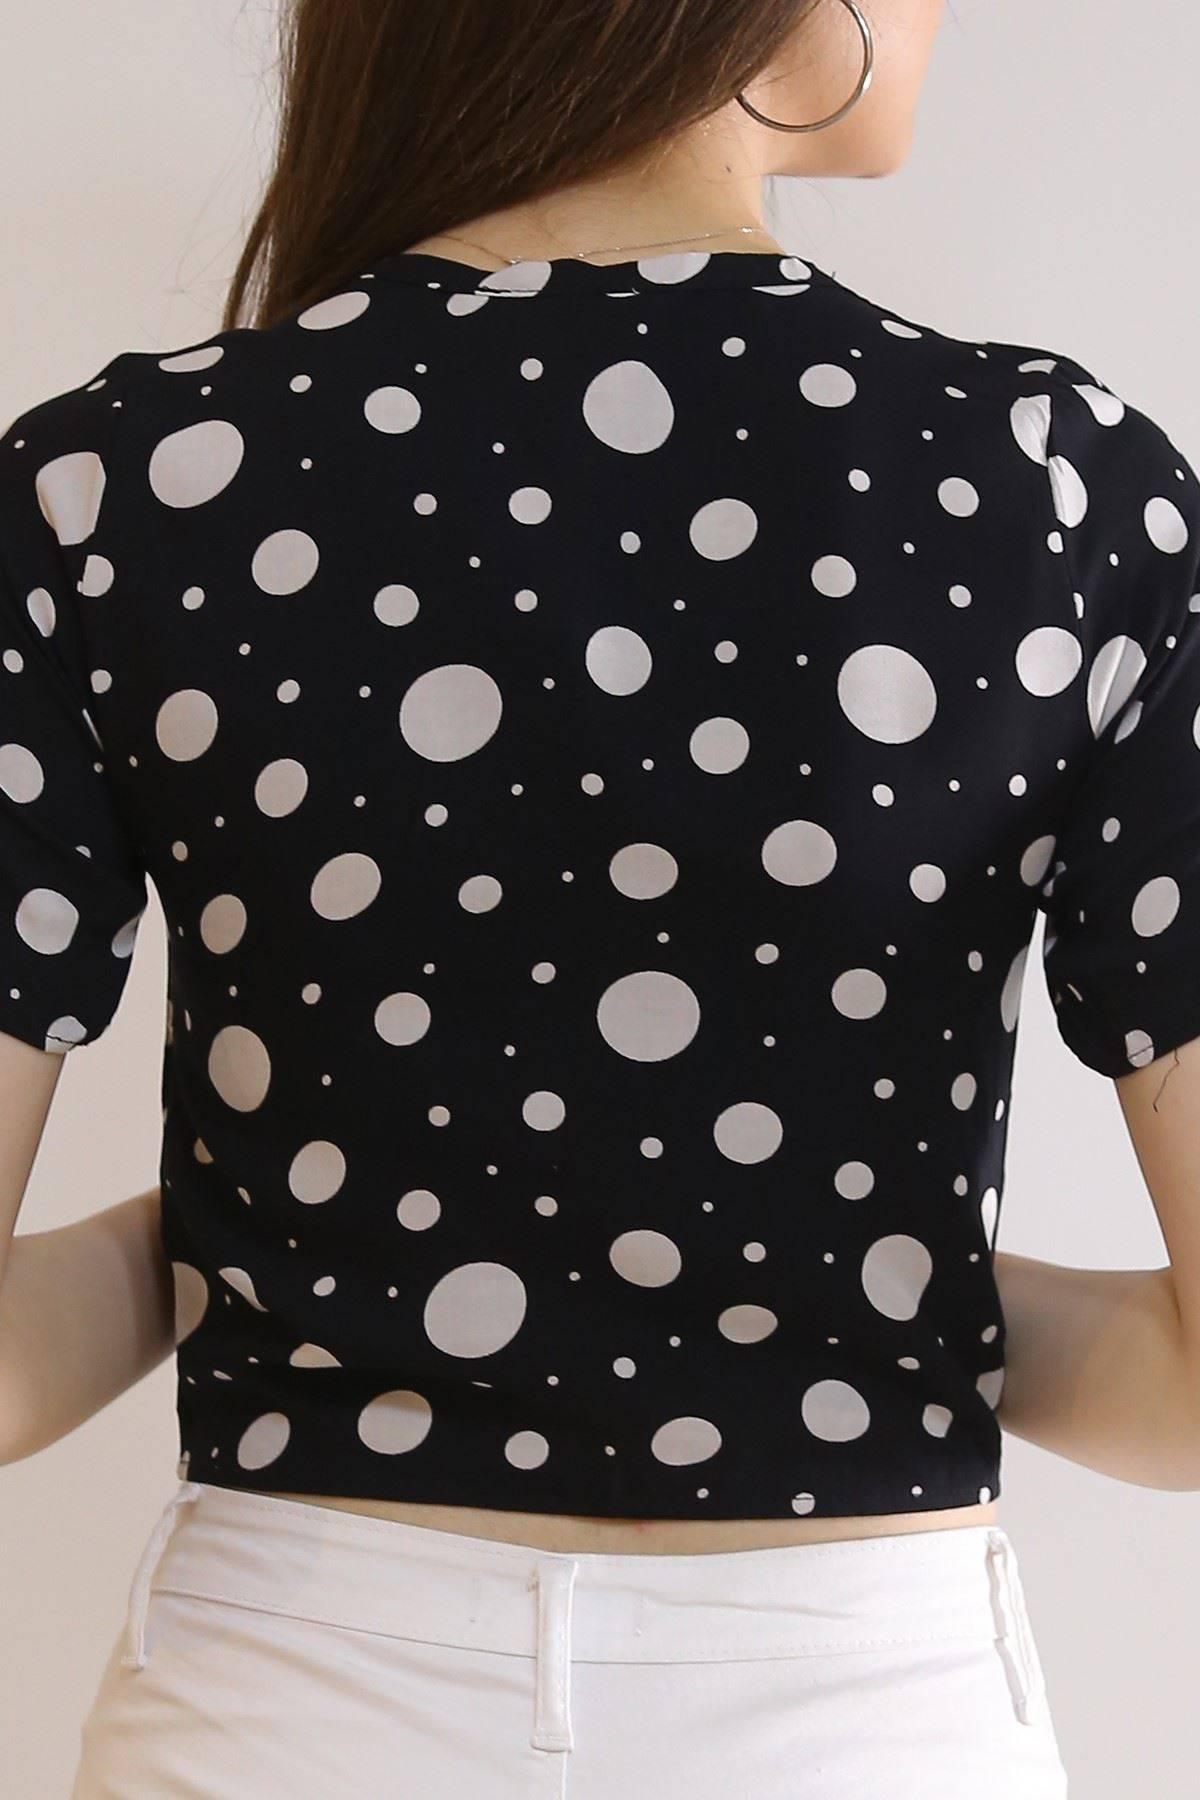 Altı Bağlamalı Bluz Siyahpuanlı - 5835.1153.